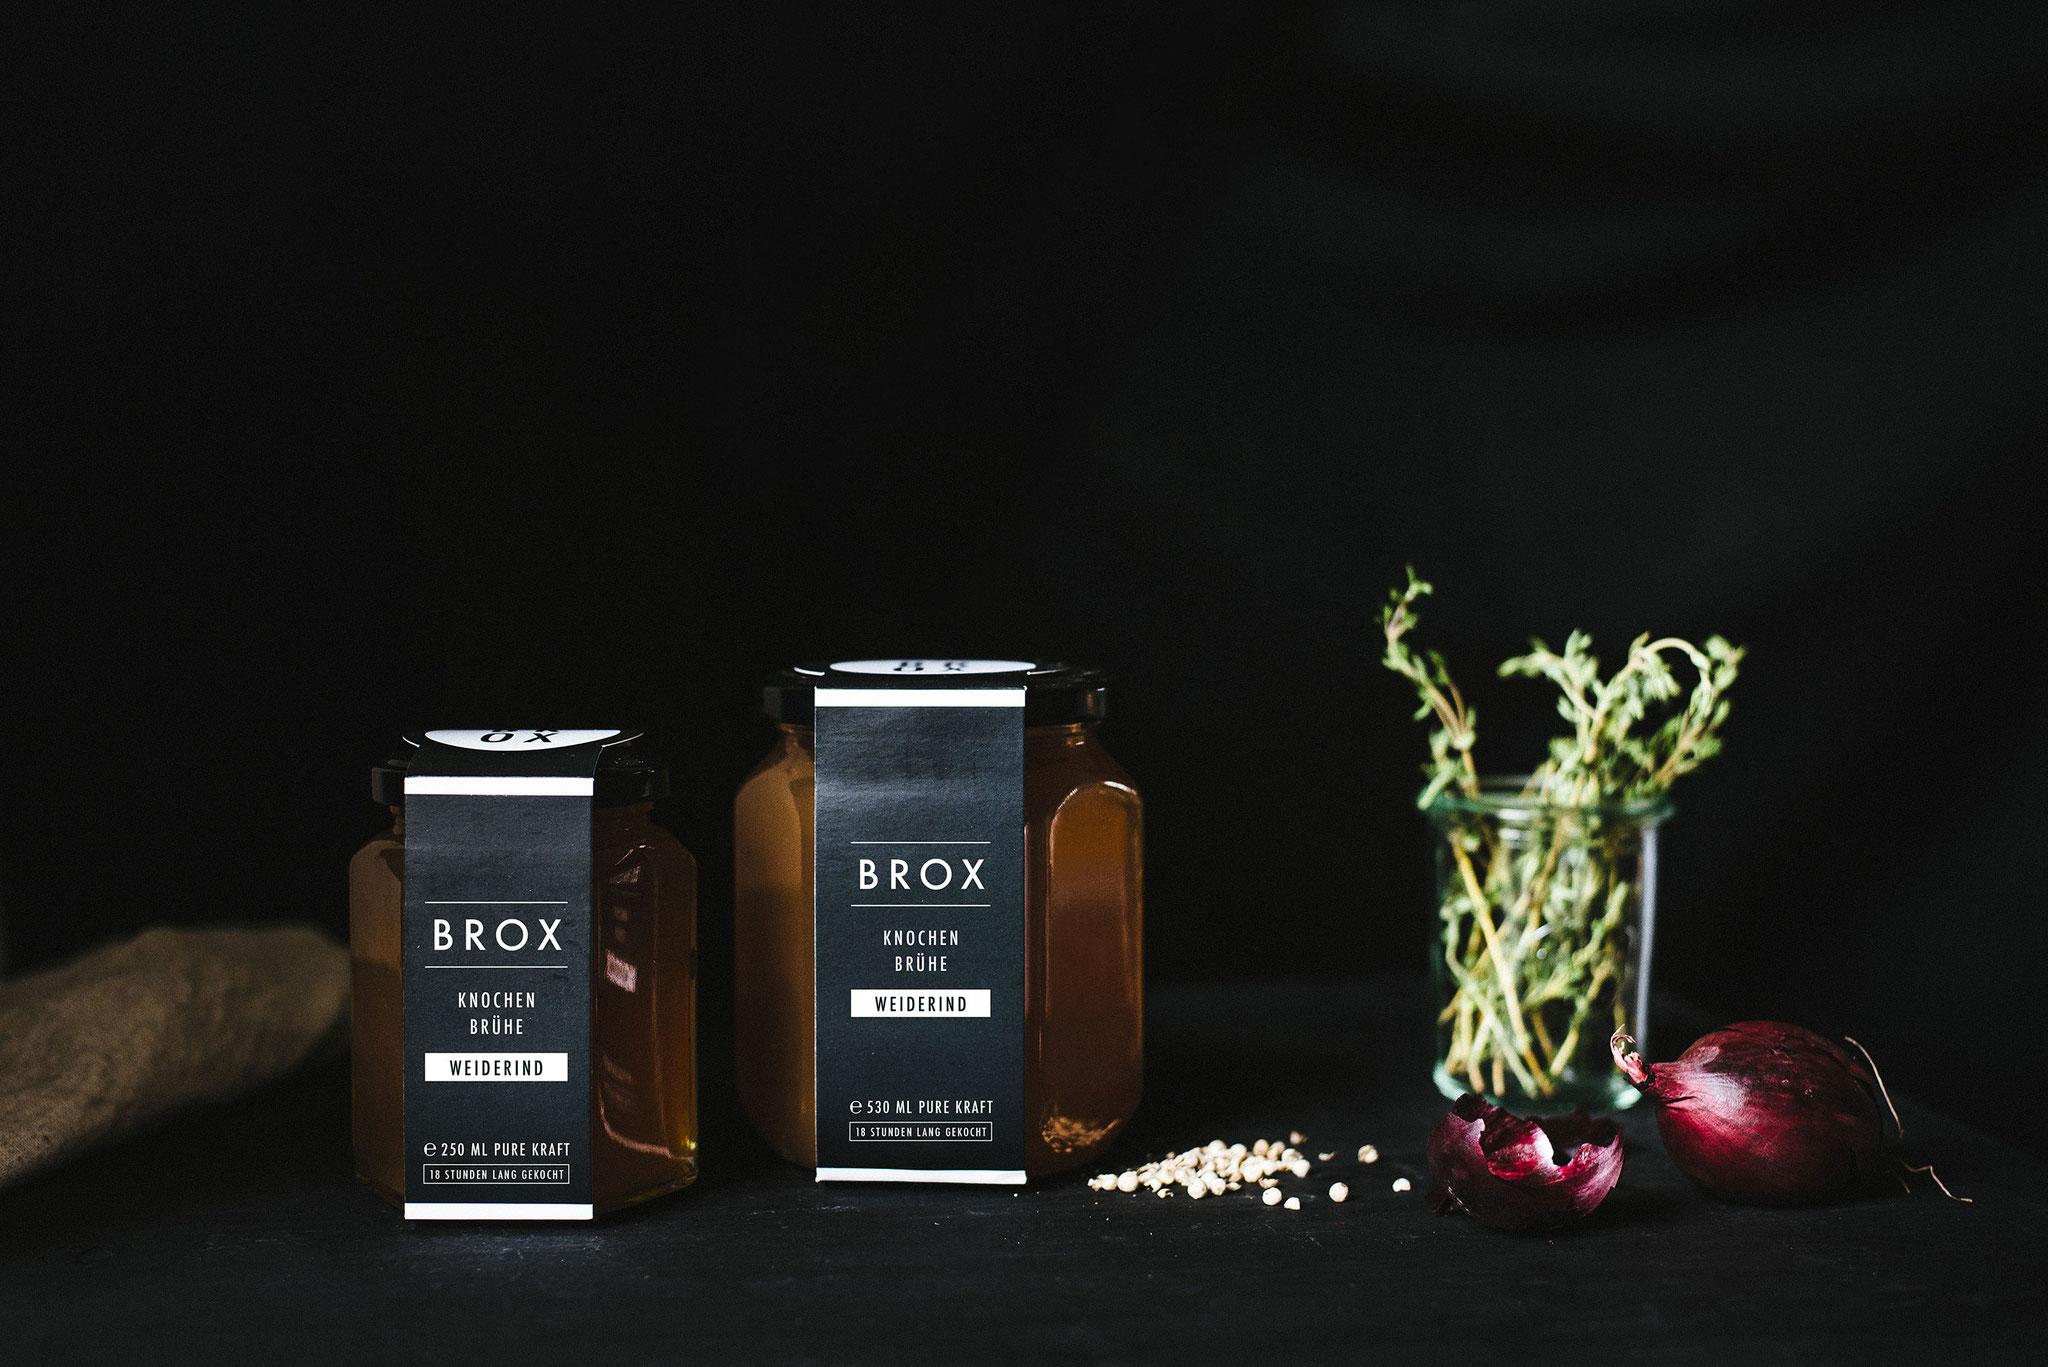 Produkttest: Brox - Bio Knochenbrühe im Glas